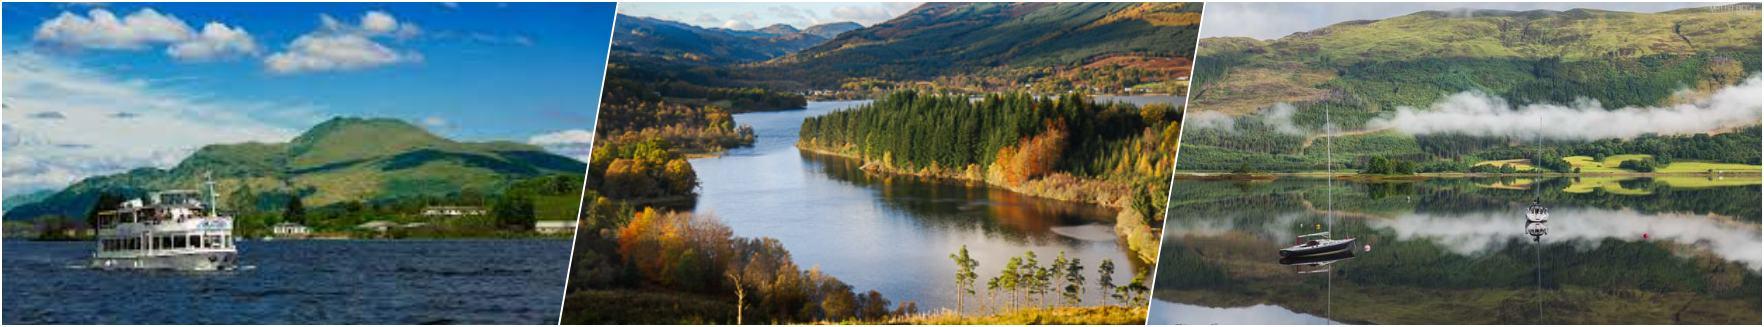 Loch Lomond - Trossachs - Glencoe